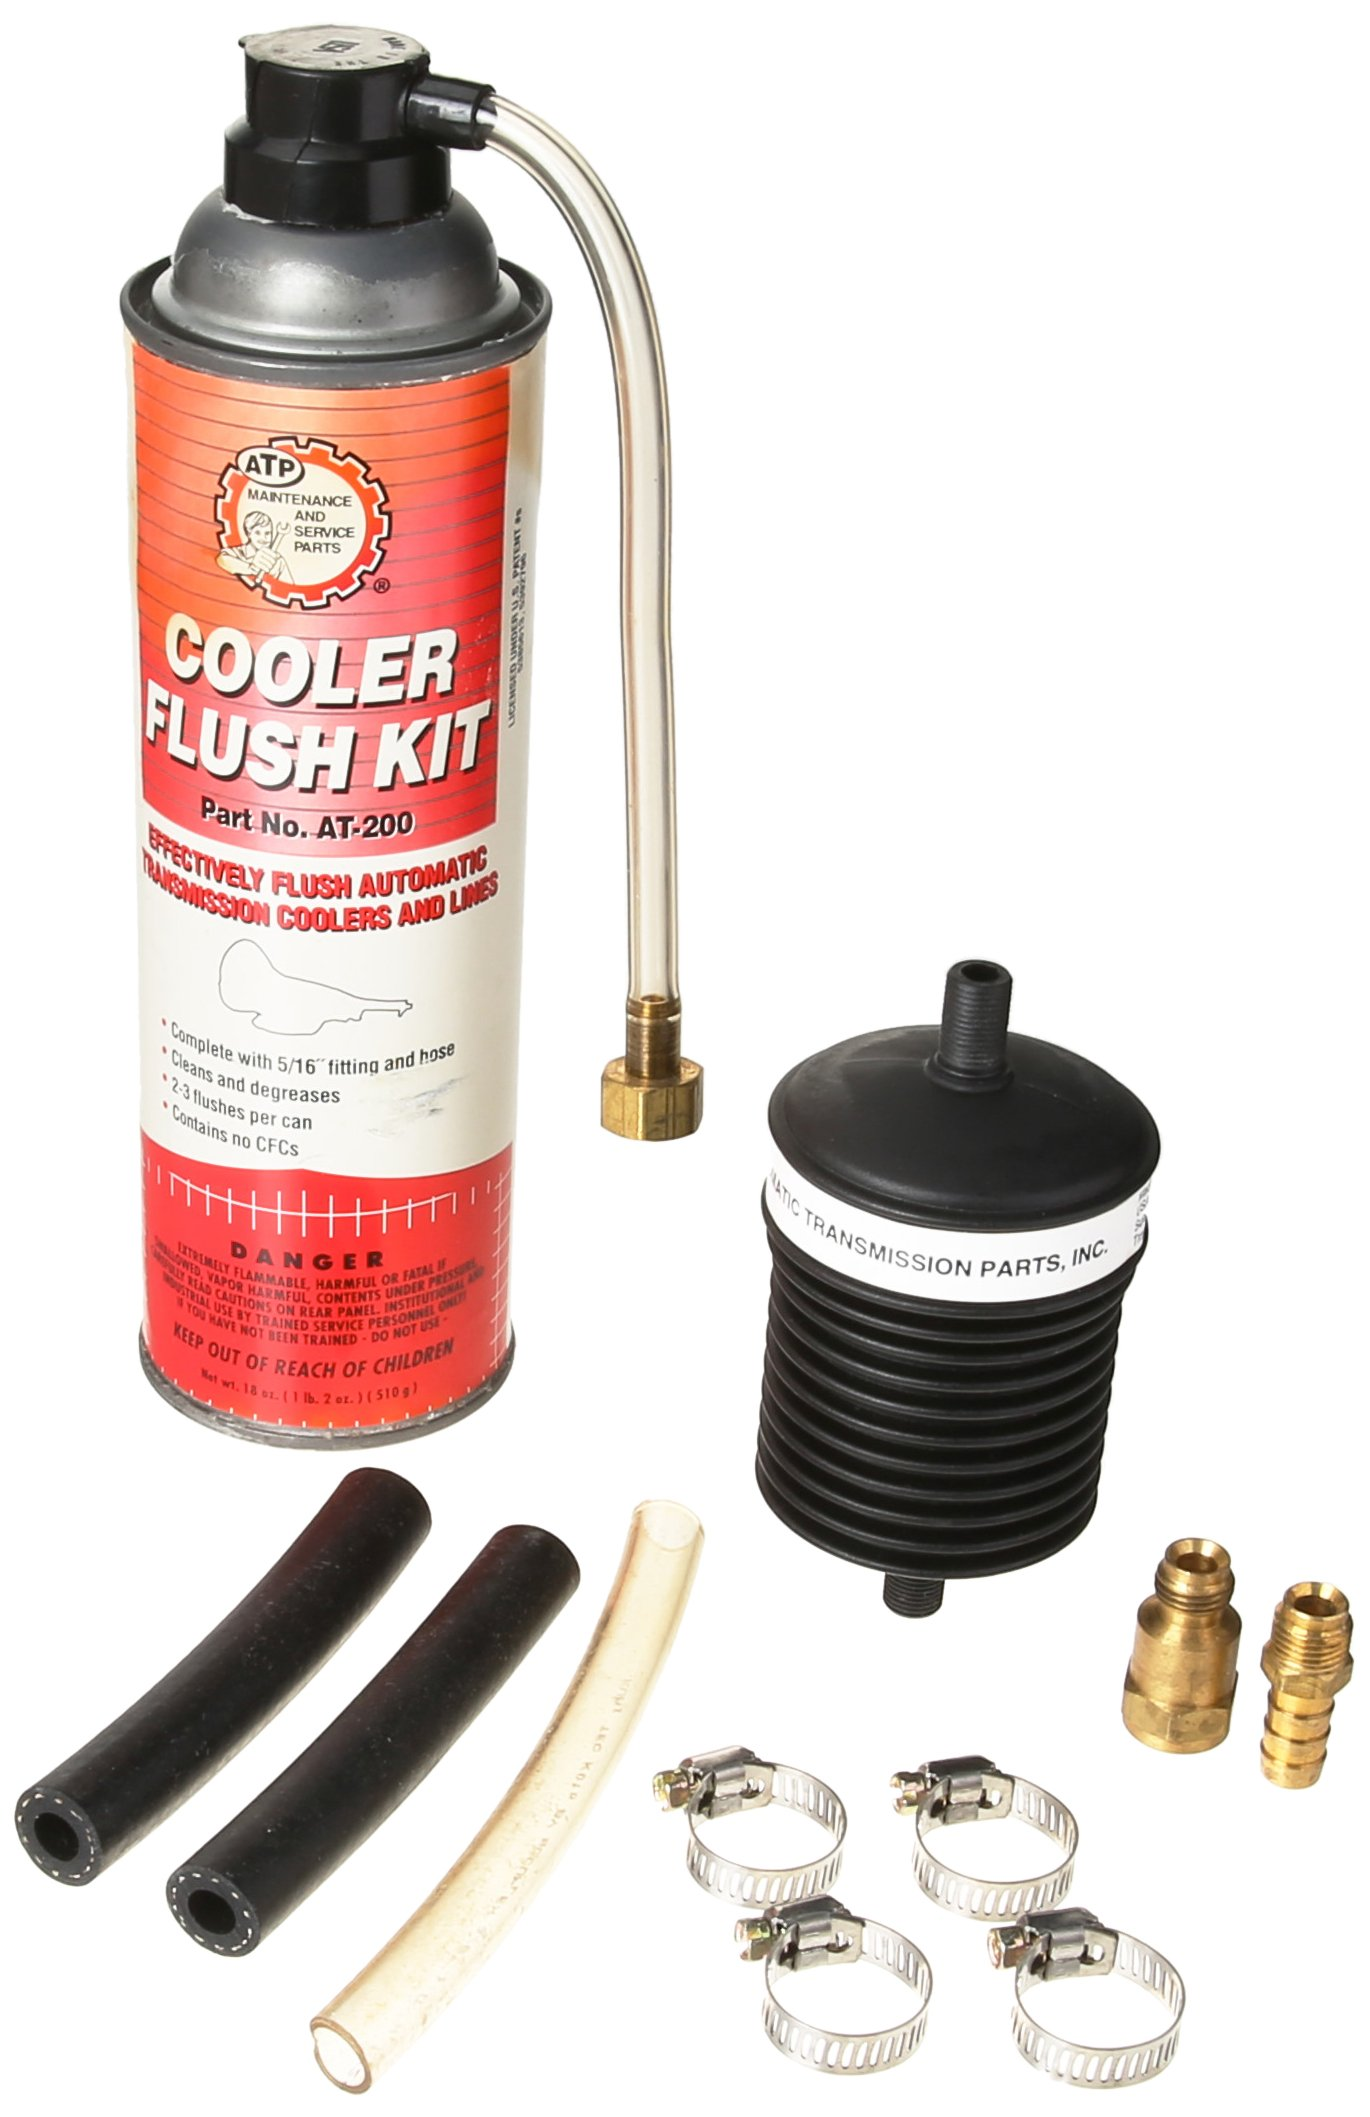 ATP ATS-200 Flush 'n' Filter kit by ATP Automotive